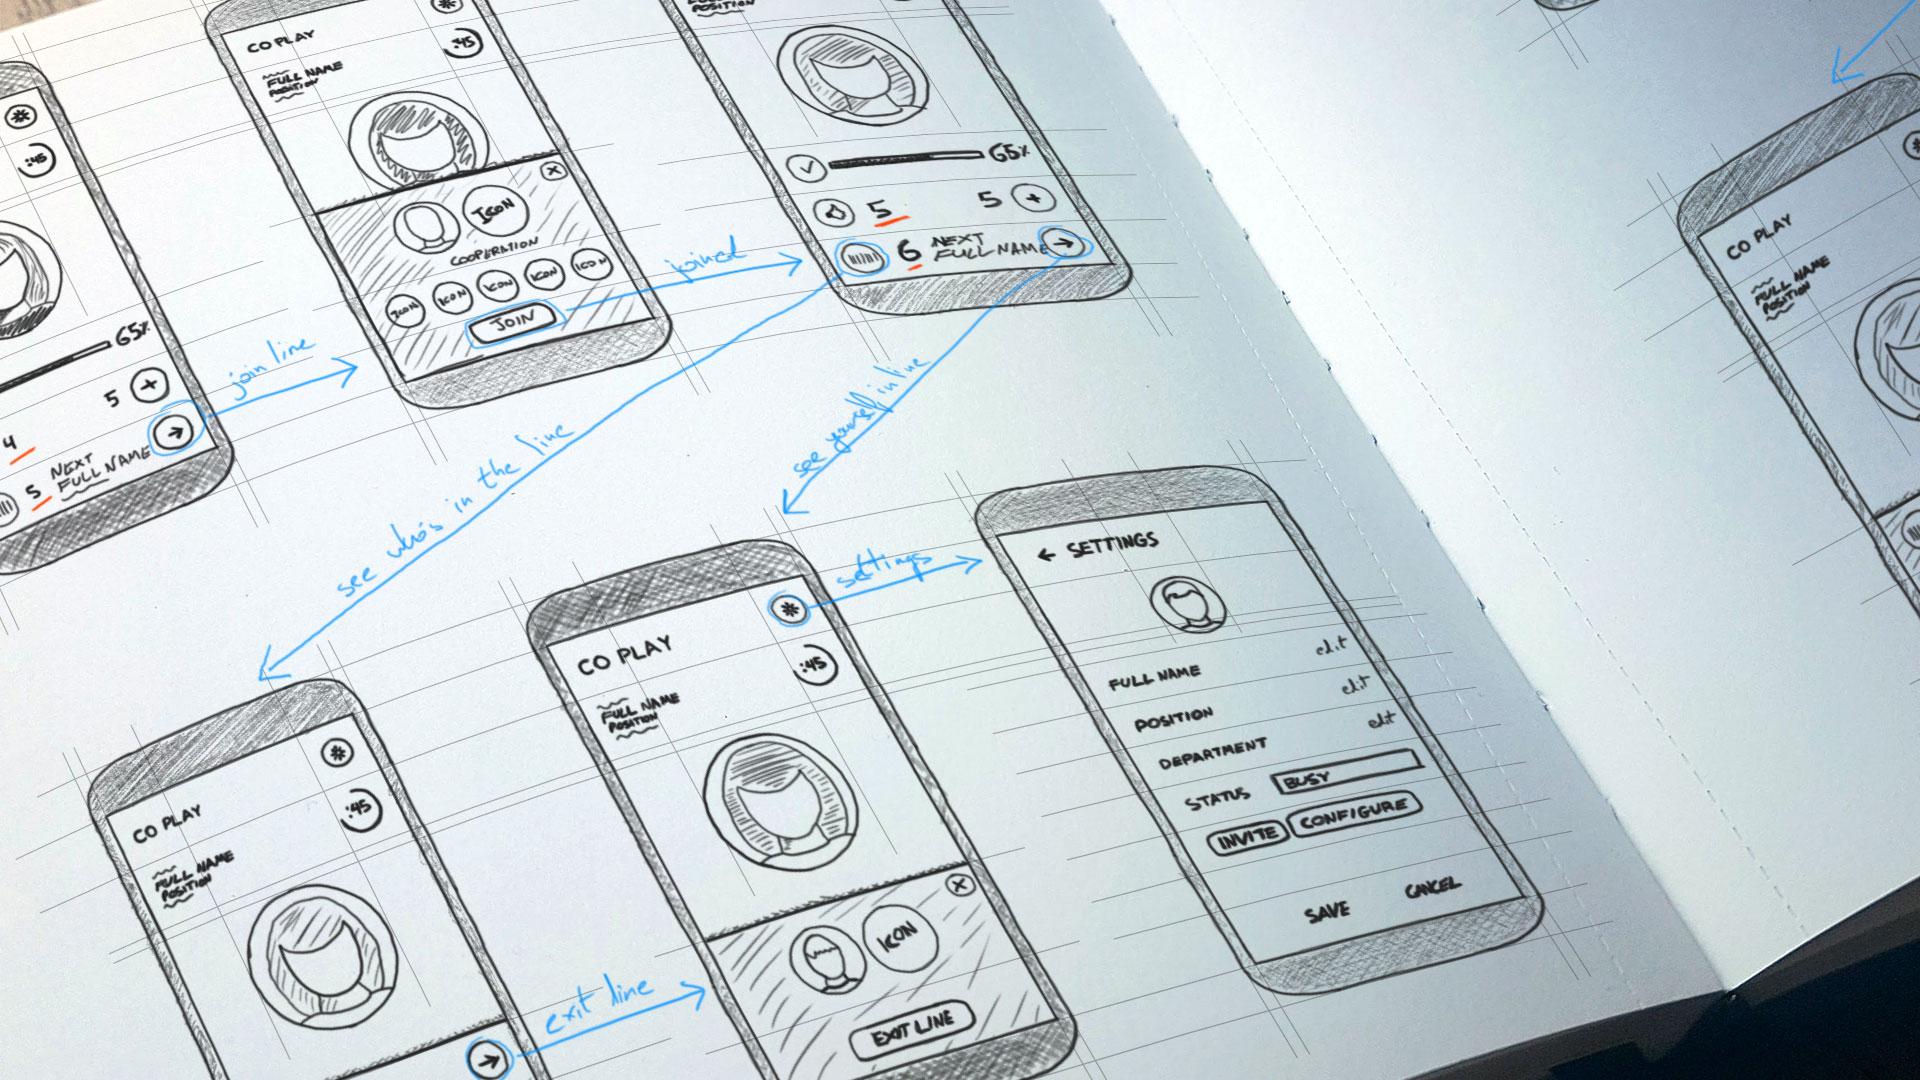 App & Web Design עיצוב אפליקציות ורשת co-play